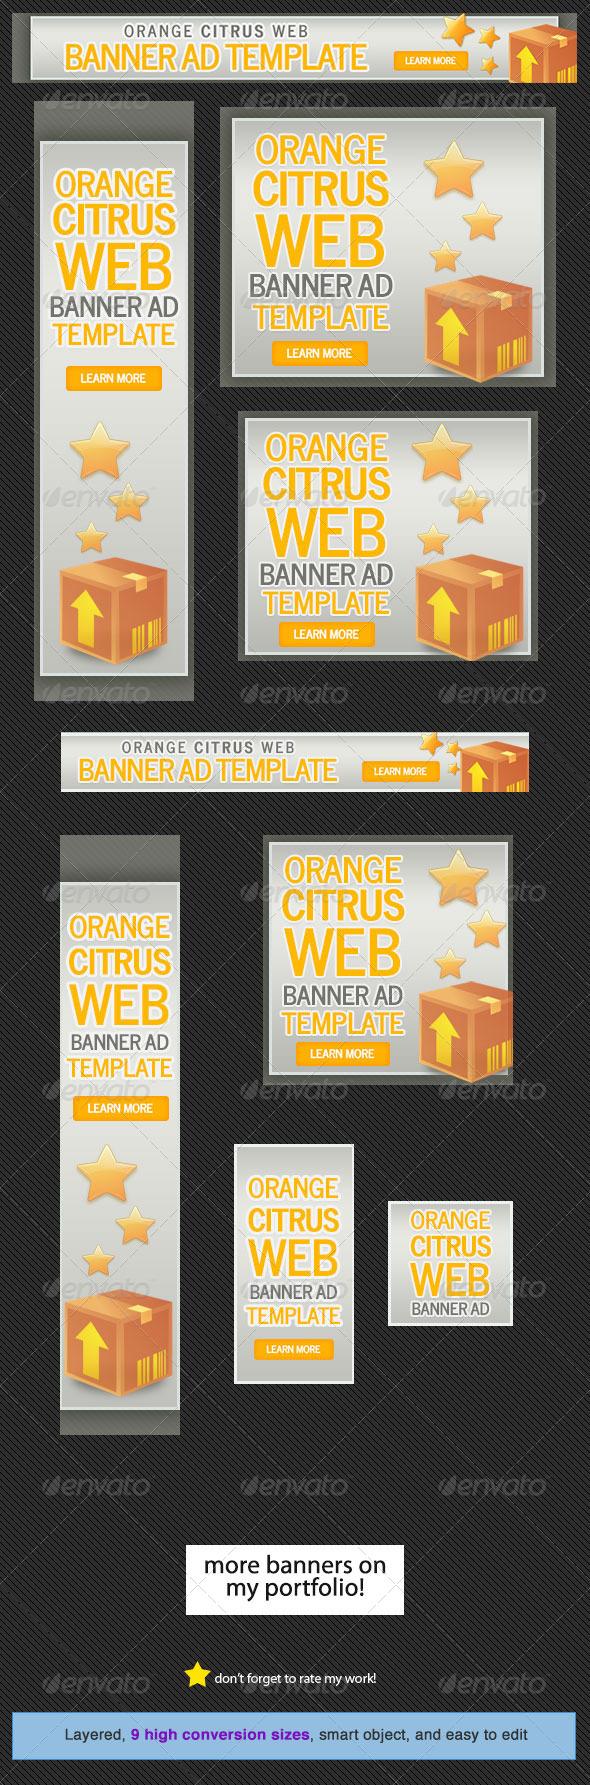 GraphicRiver Orange Citrus Web Banner 5287945